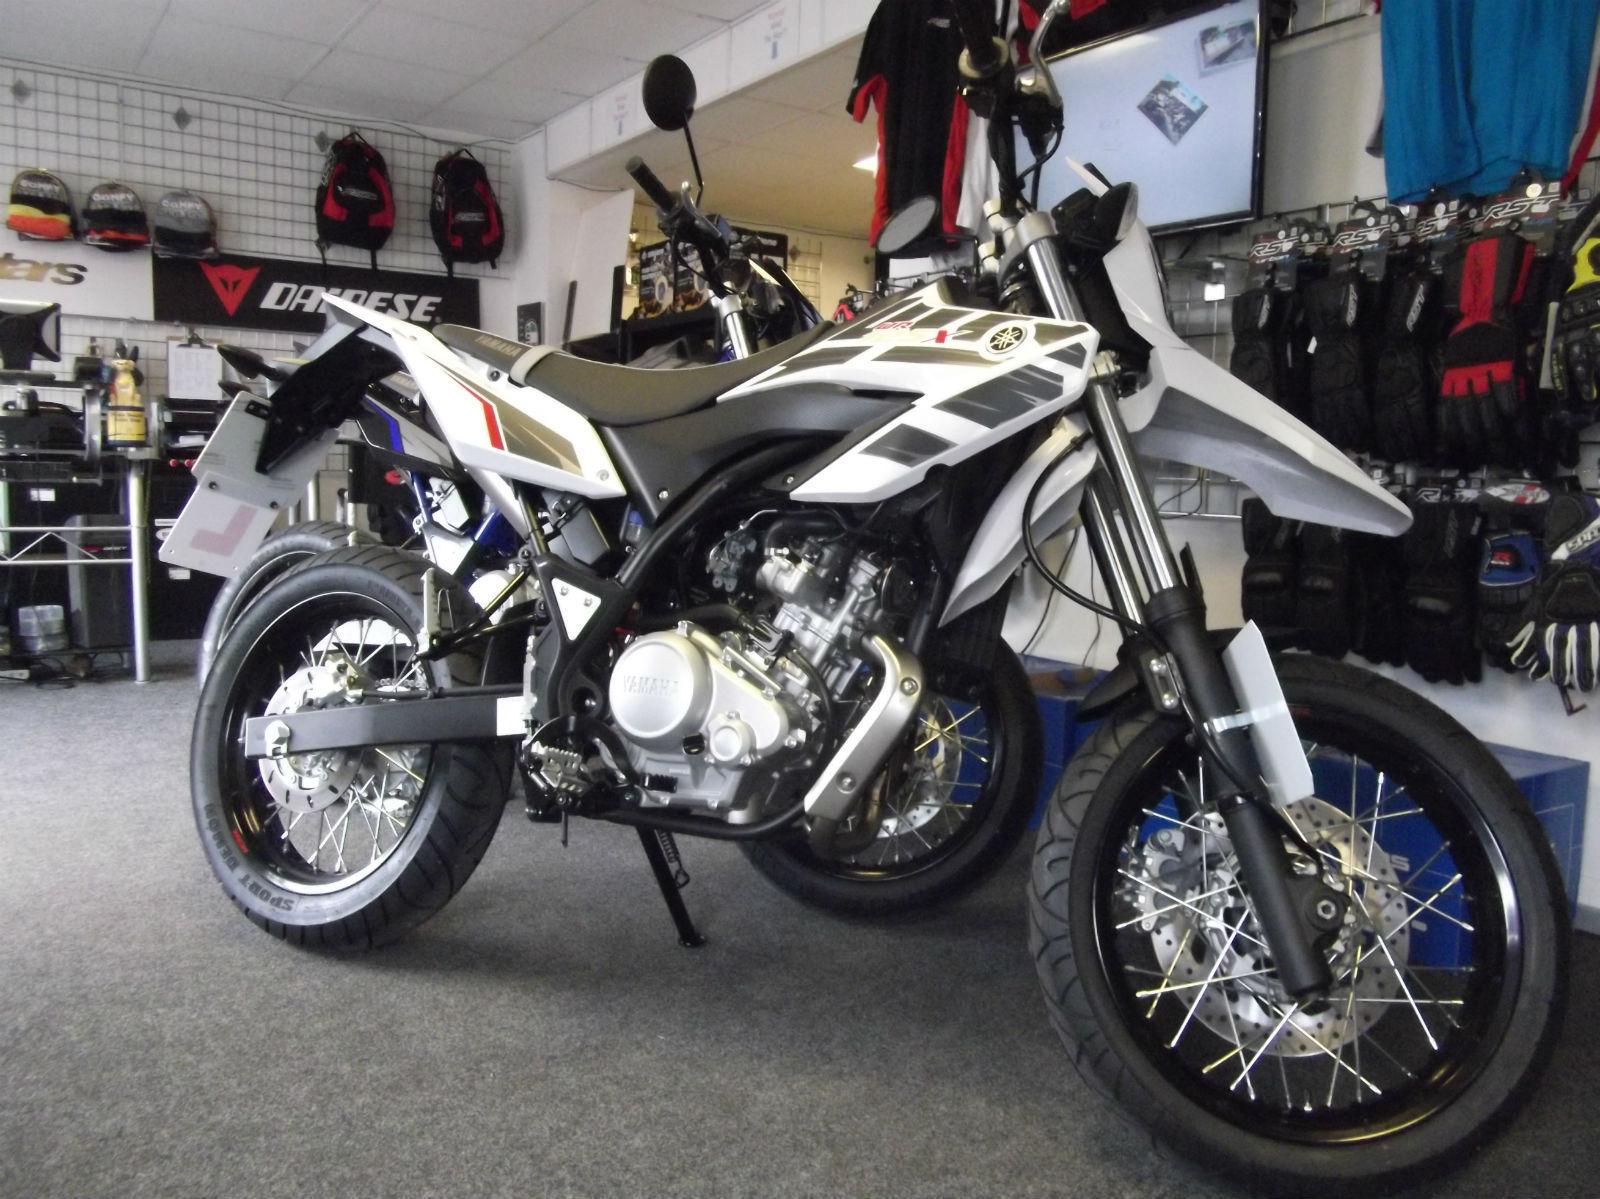 Yamaha wr125x 125cc supermoto motorcycle finance brand for Yamaha motorcycle brands